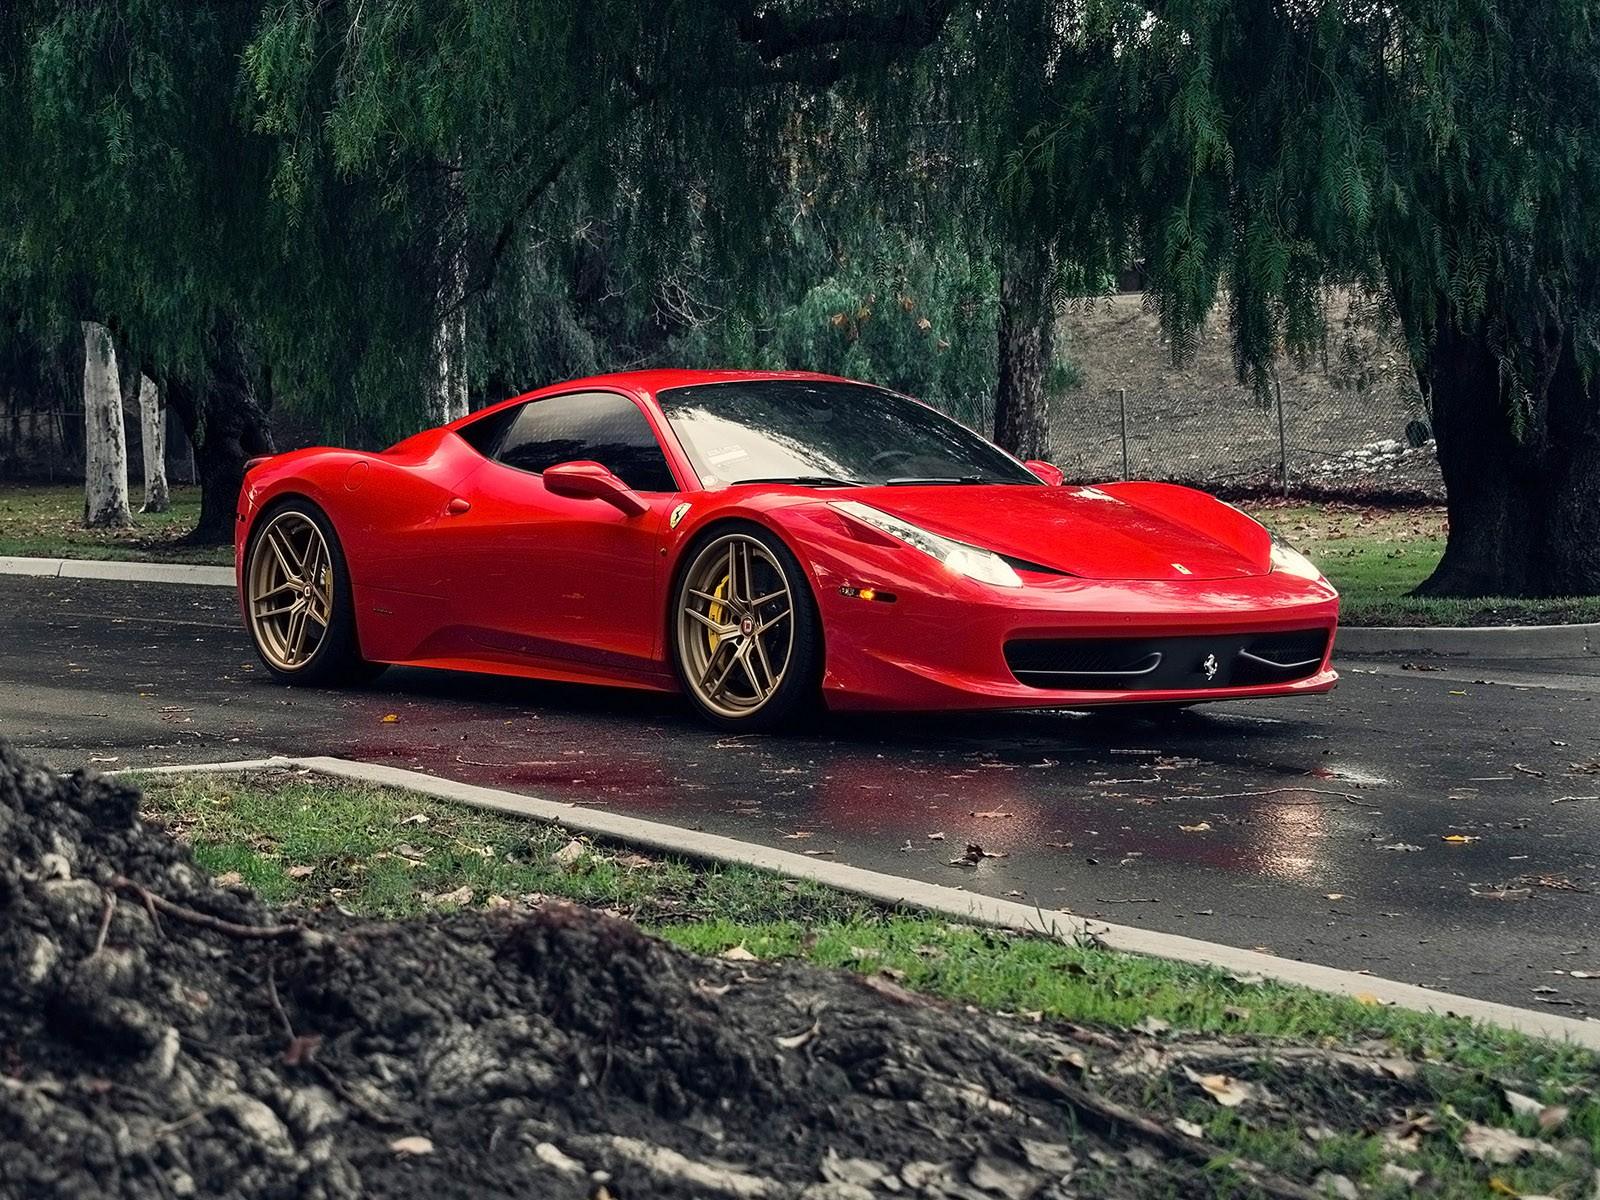 2015 Ferrari 458 Italia - Klassen ID